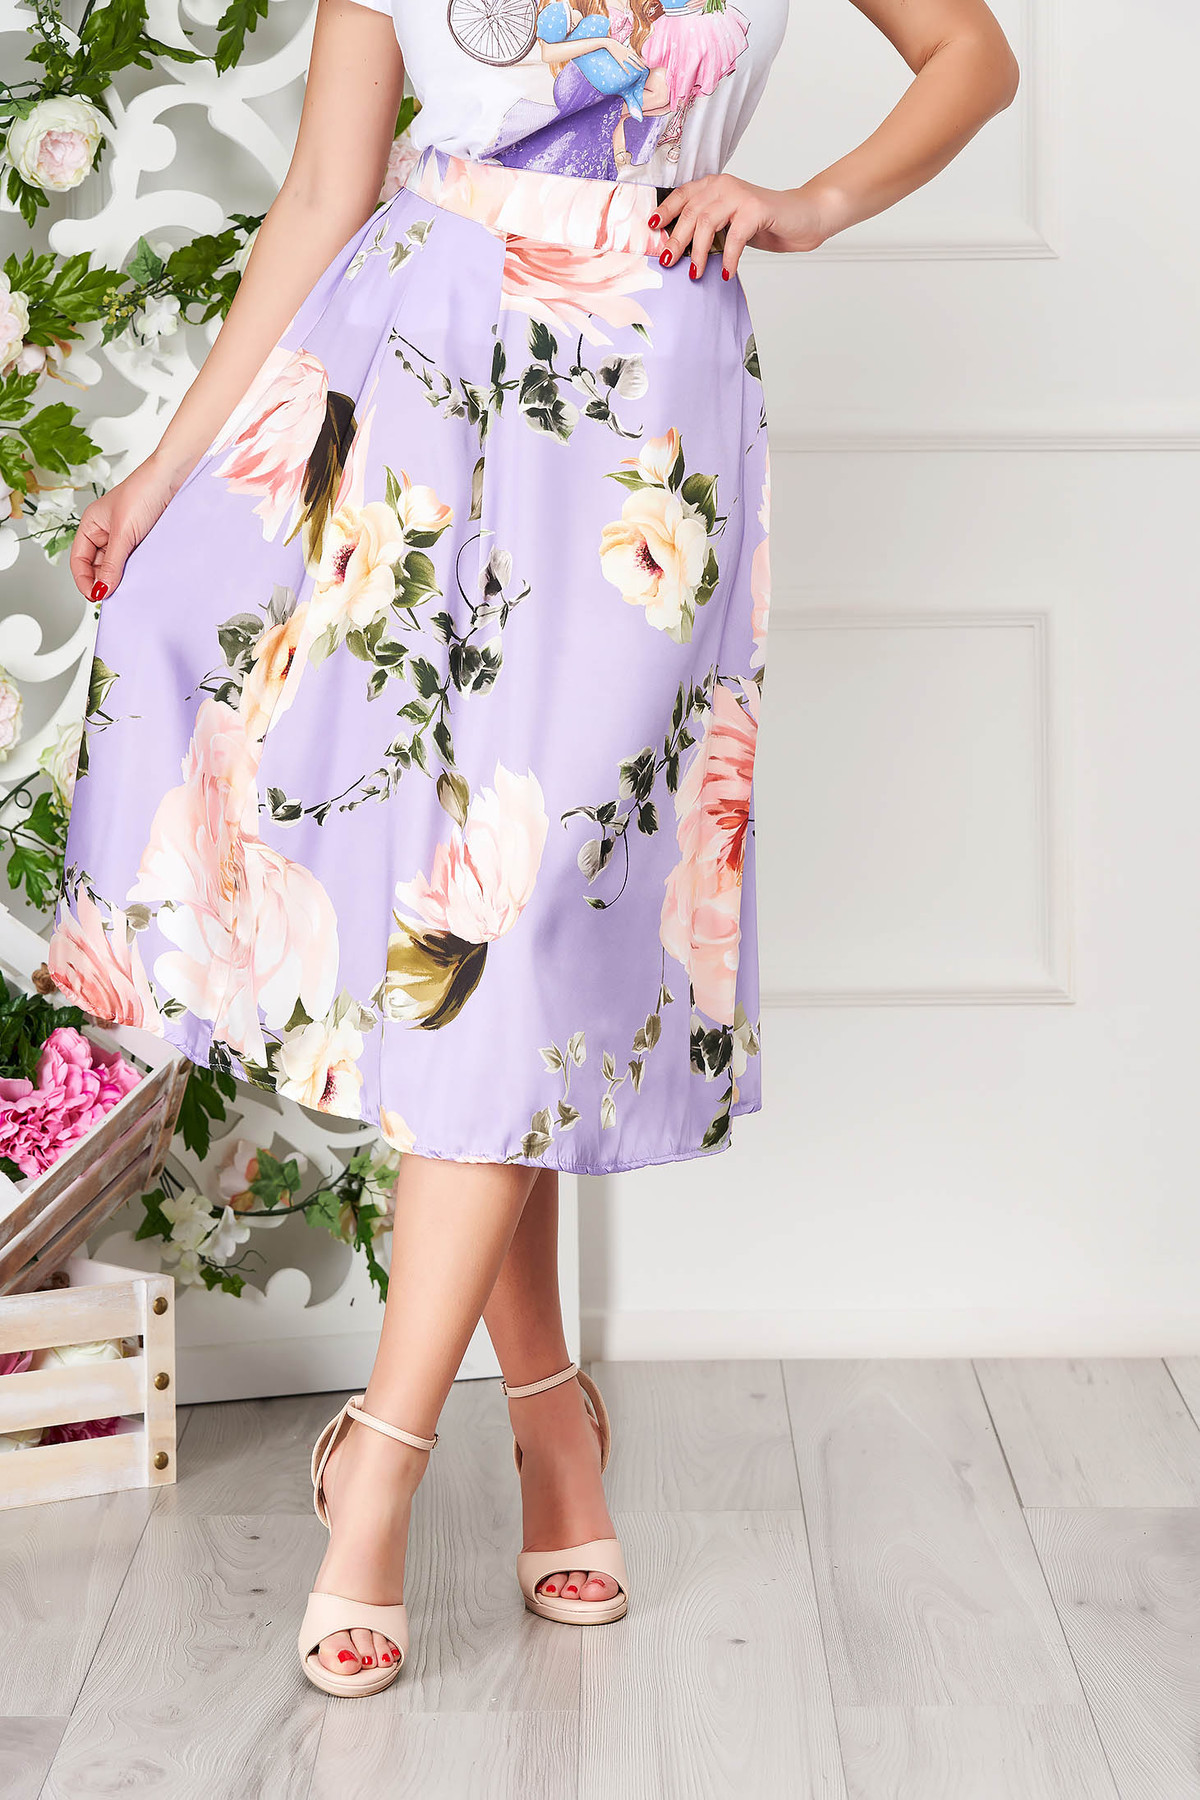 Fusta SunShine mov eleganta midi in clos cu imprimeu floral